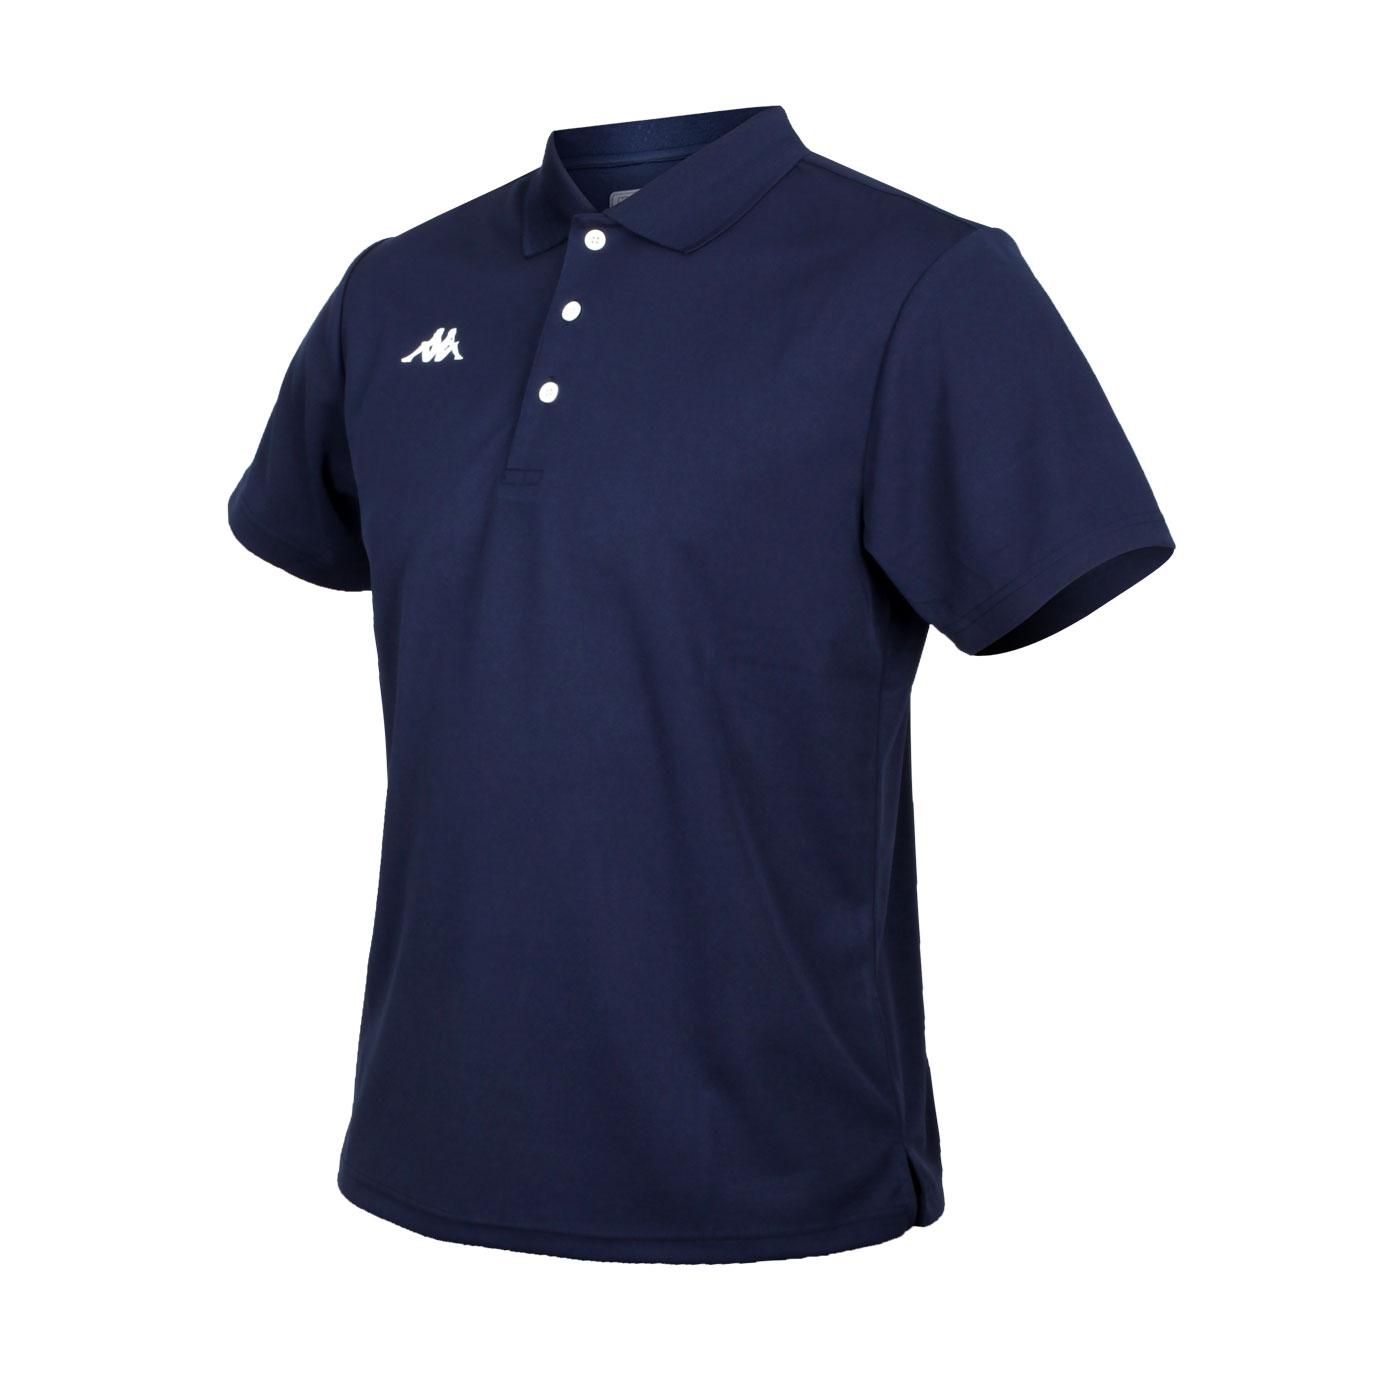 KAPPA 男款K4T短袖POLO衫 321762W-B29